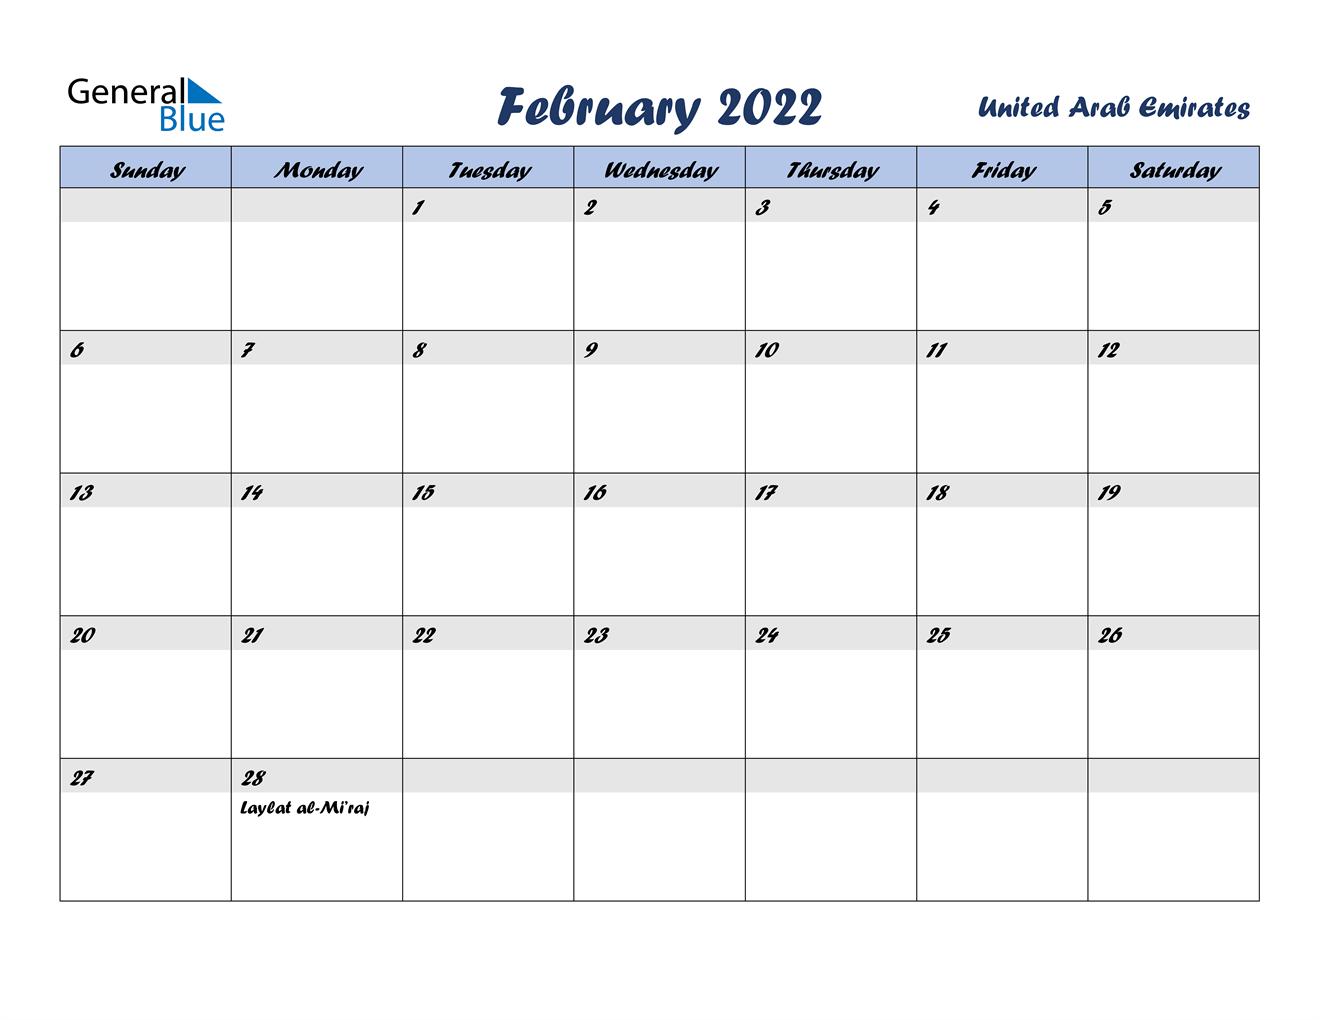 February 2022 Calendar - United Arab Emirates